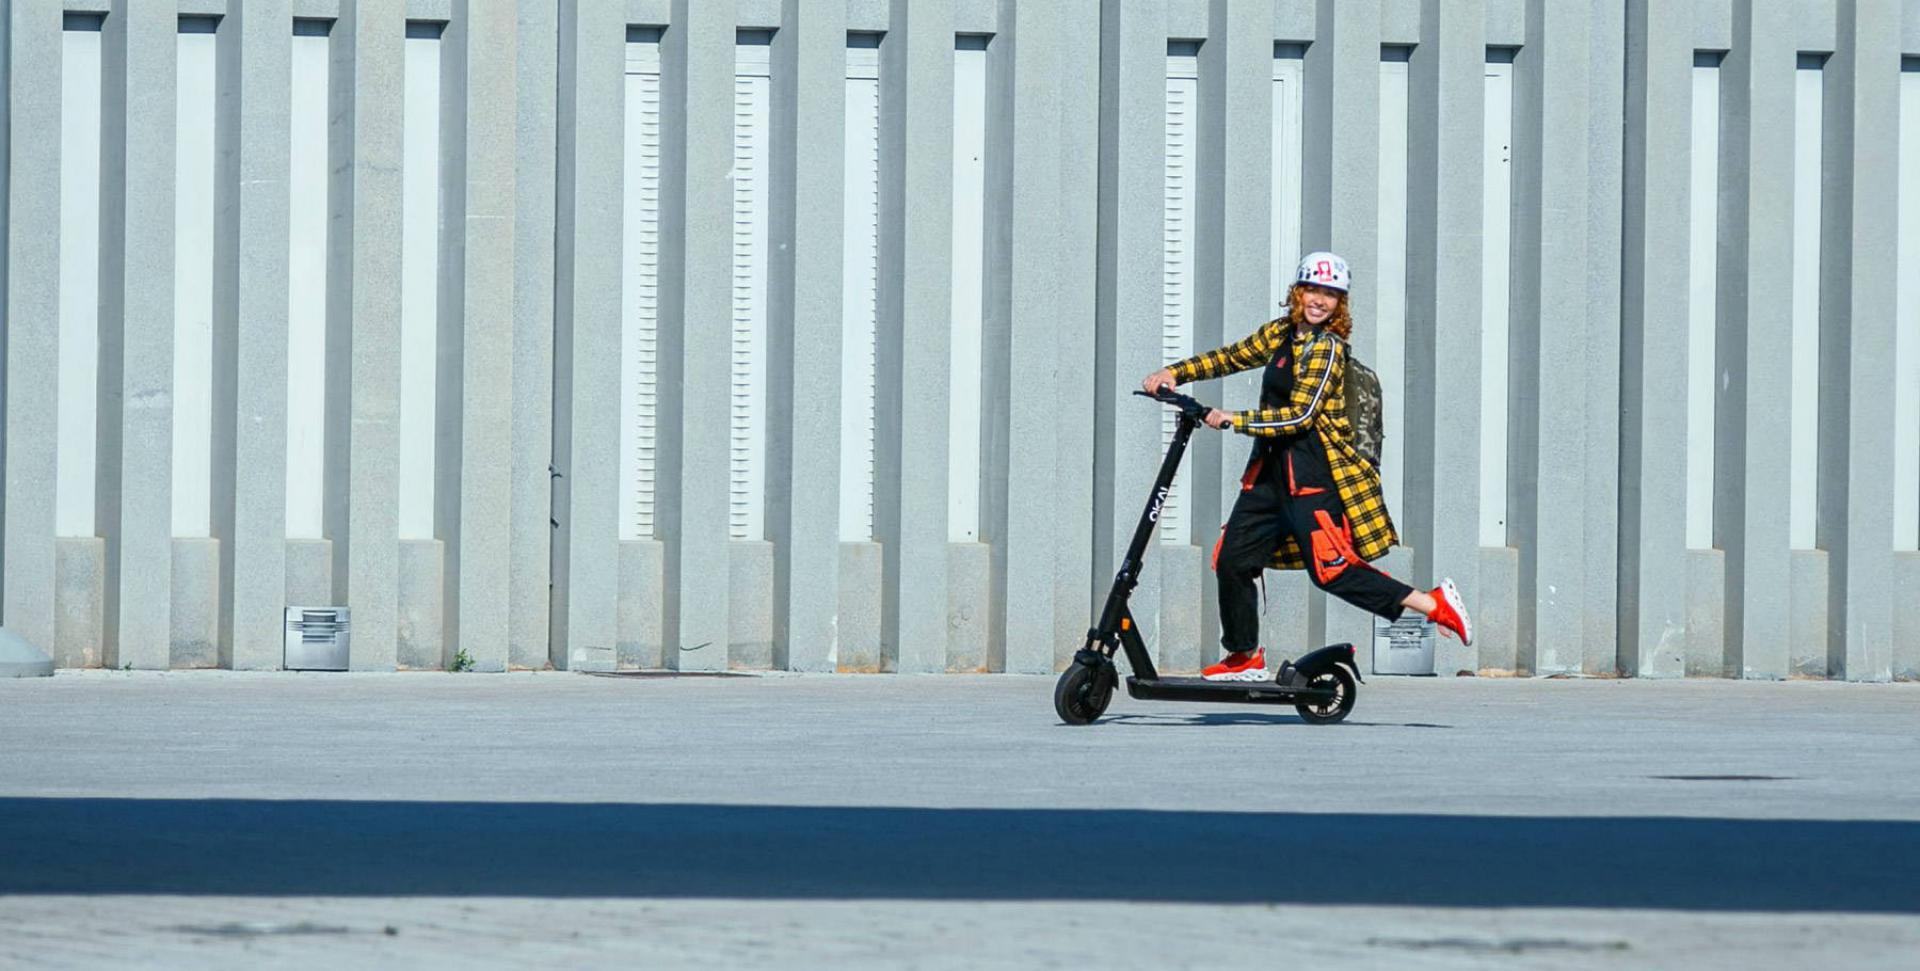 okai-escooter-es200-riding-woman-urban.jpeg